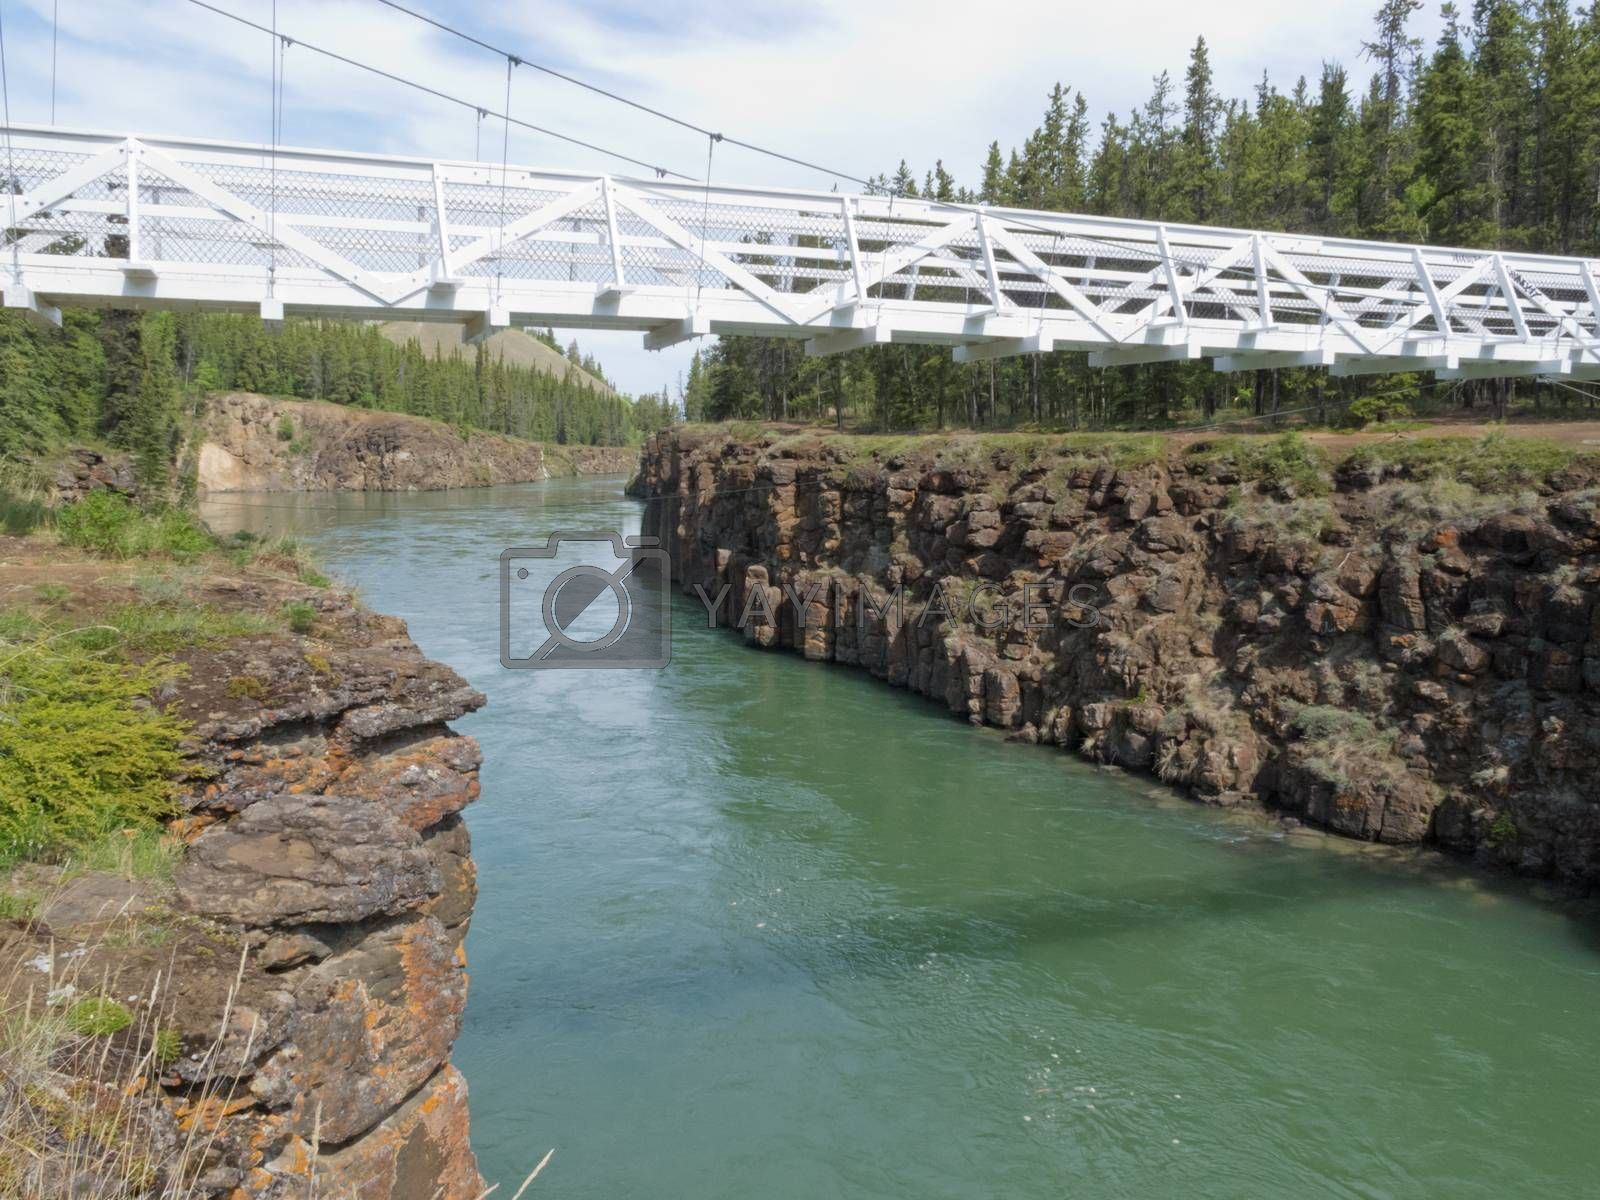 White suspension bridge across Miles Canyon Yukon by PiLens